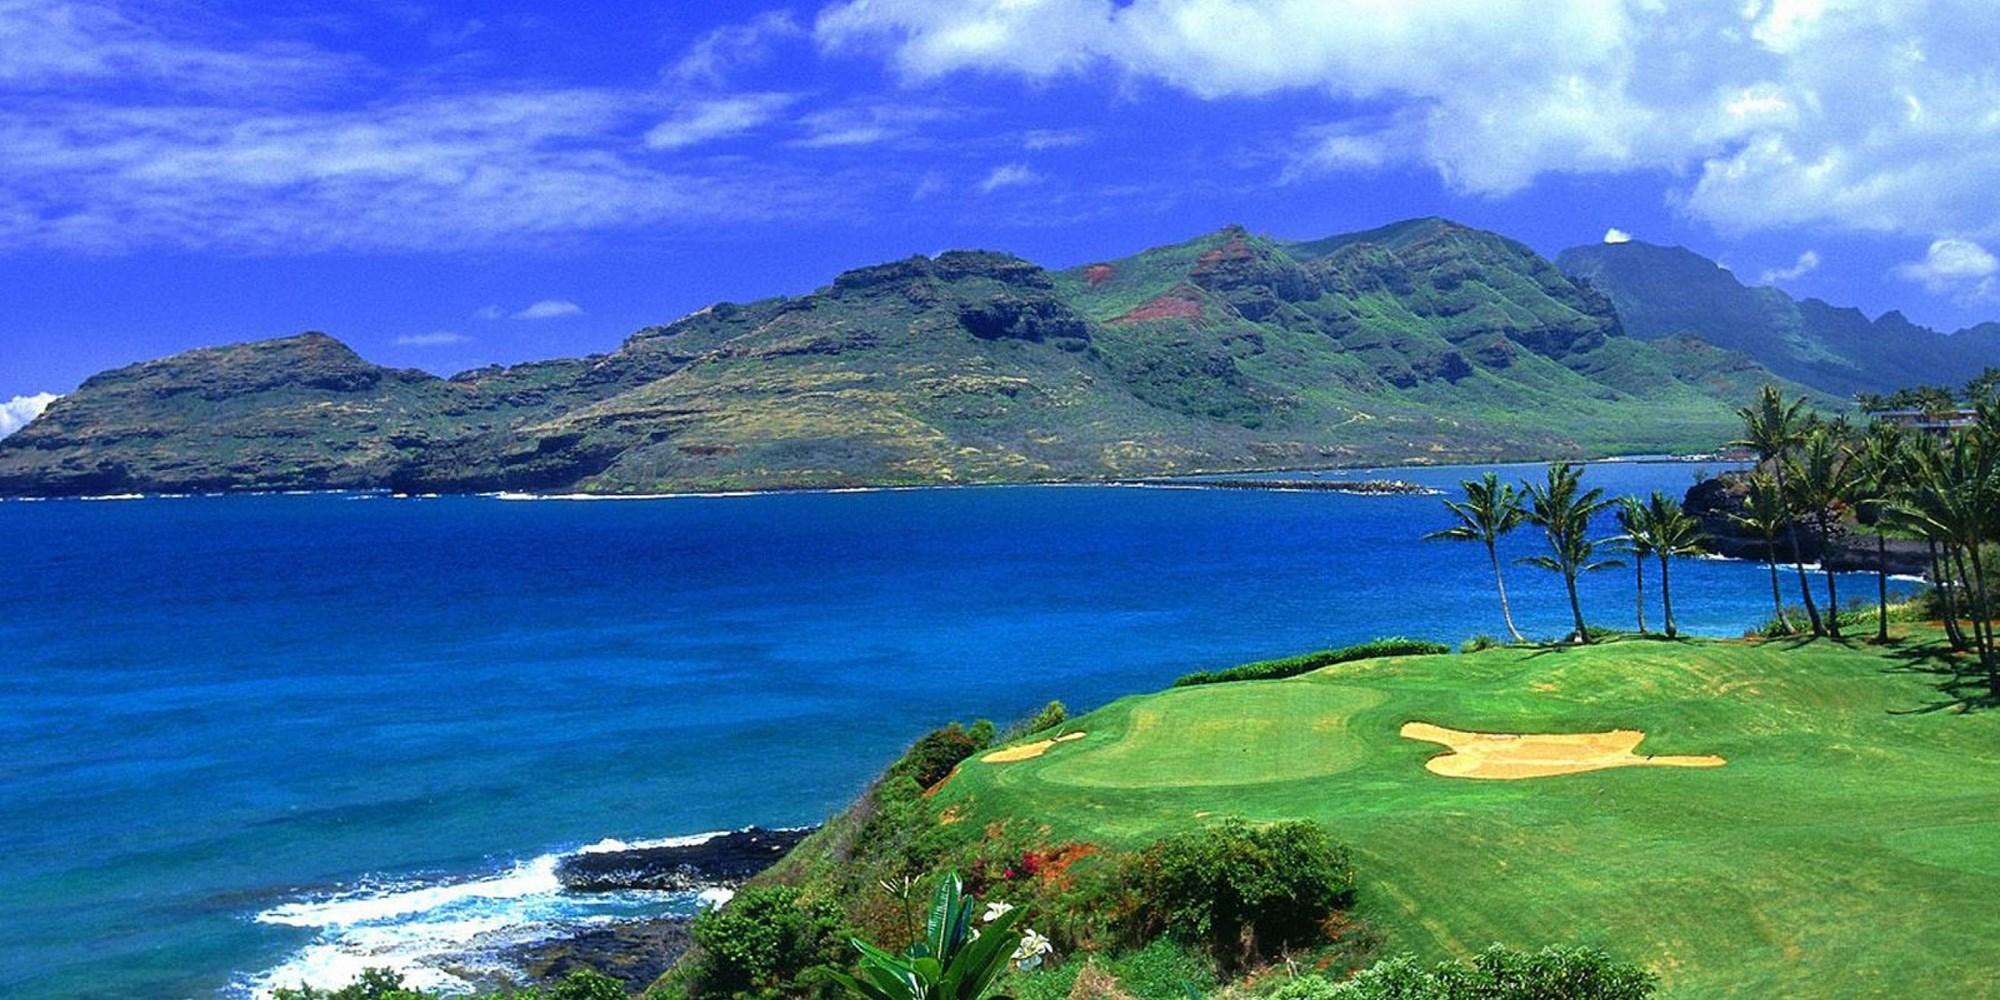 USA - Maui, Hawaii trip | 7 nights, 5 games